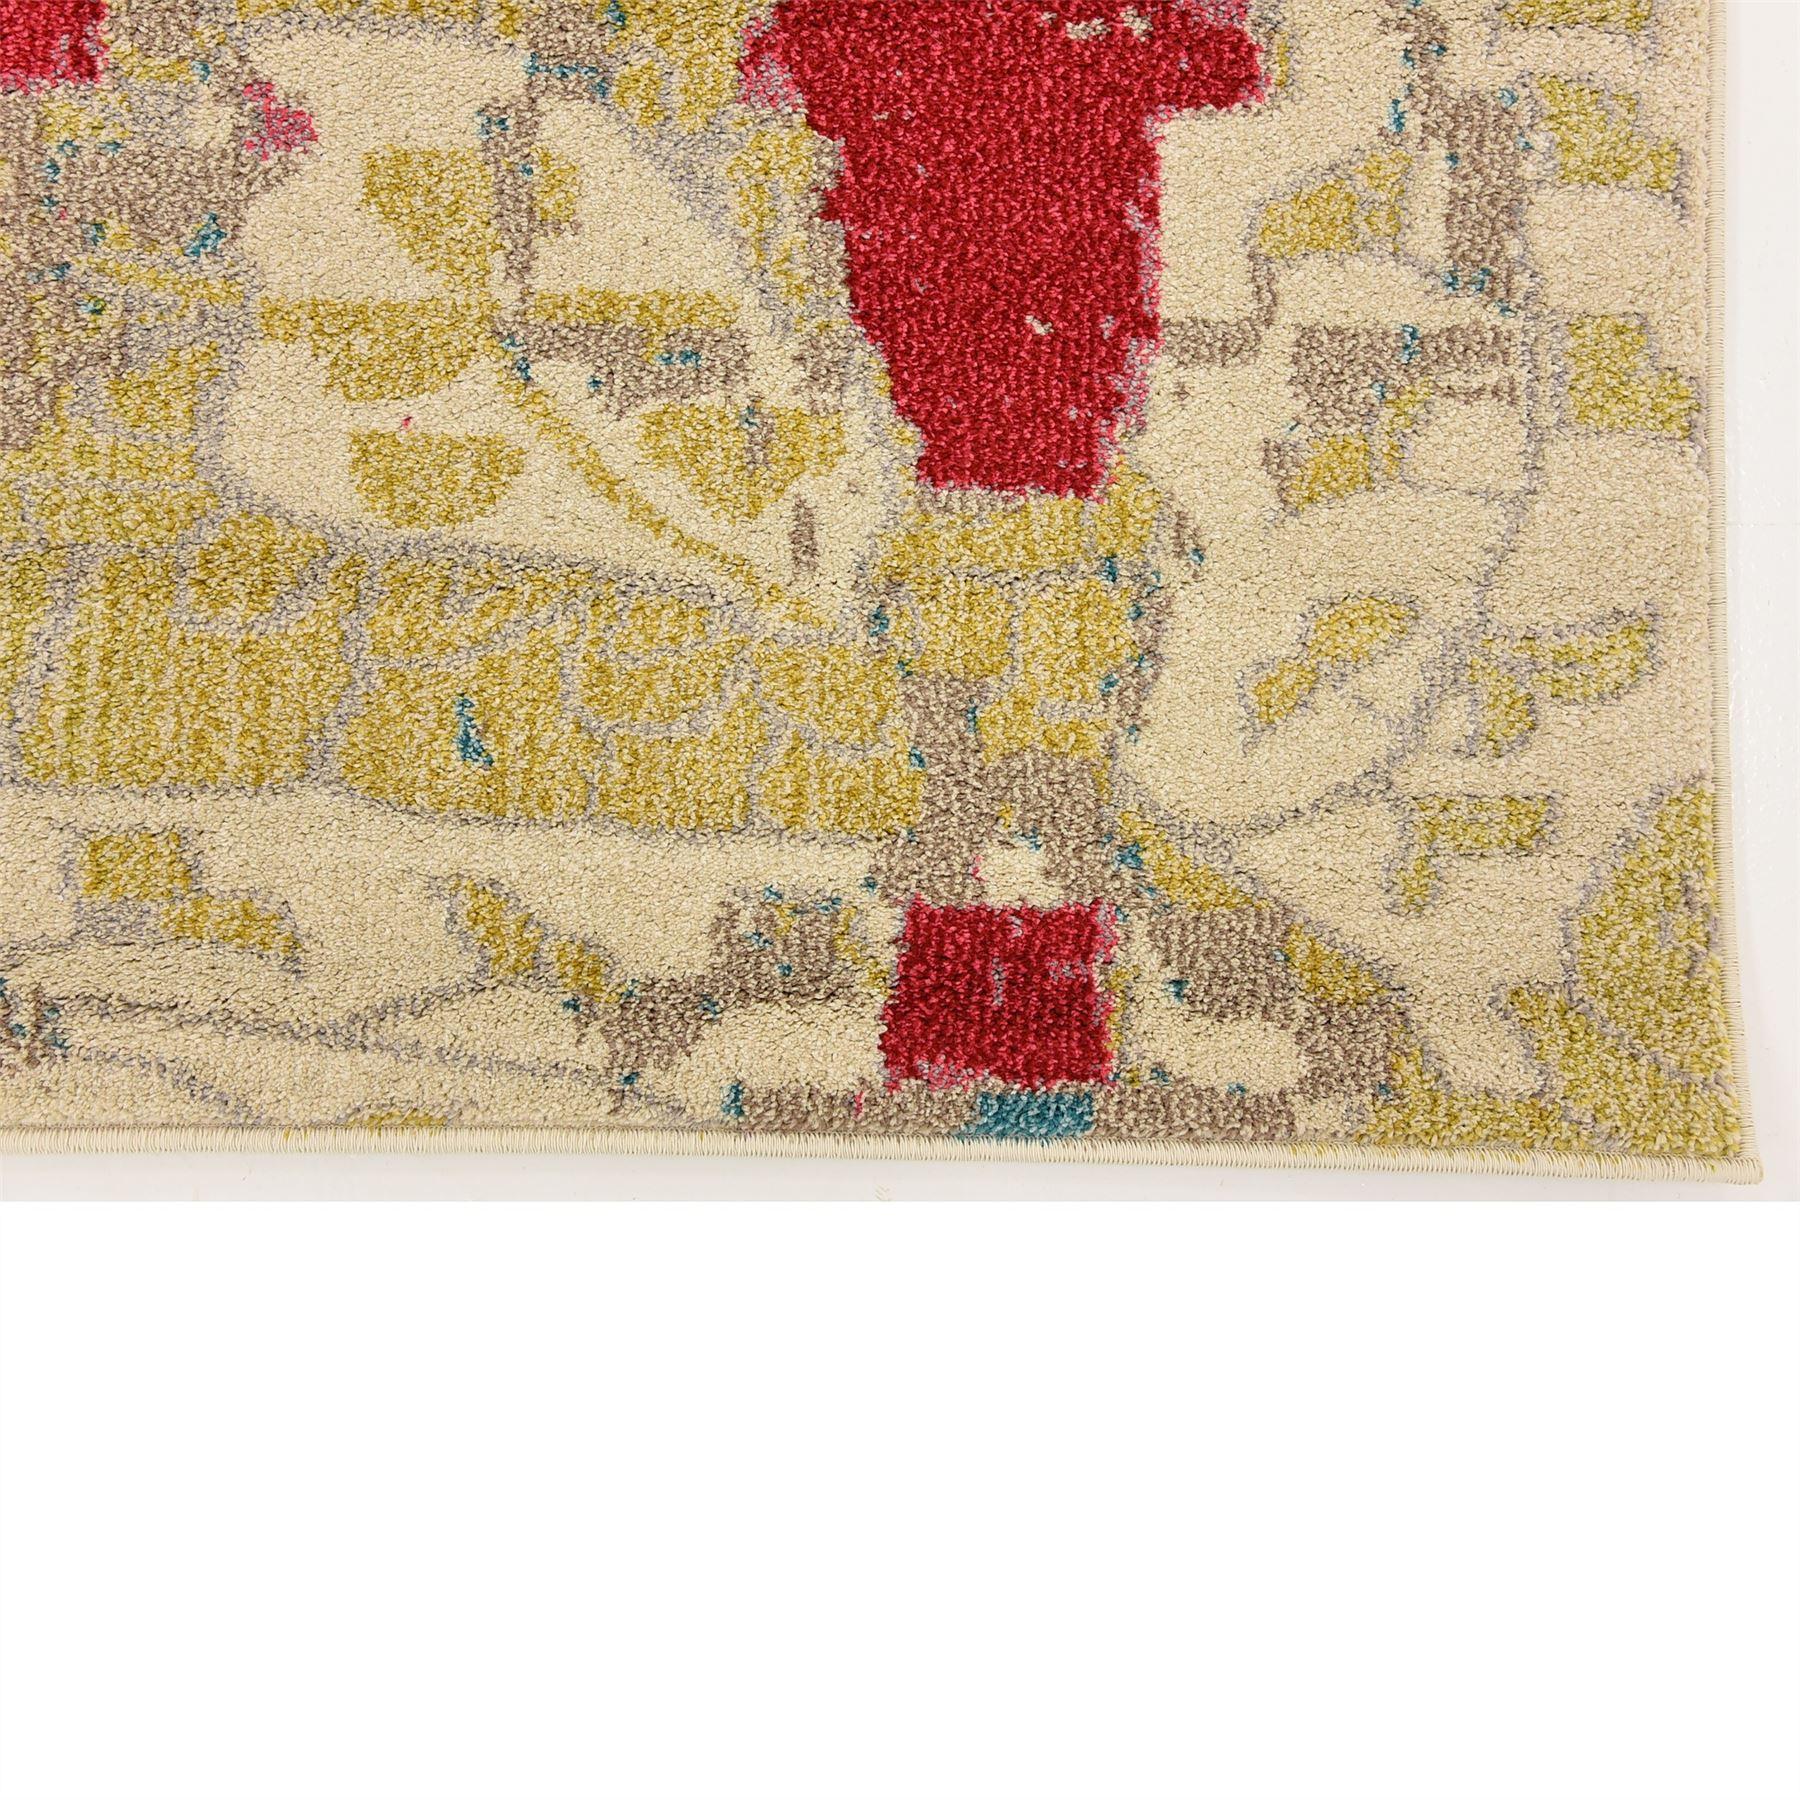 Do Area Rugs Work Over Carpet: Fringeless Floor Rug Area Carpet Over-dyed Catpets Modern